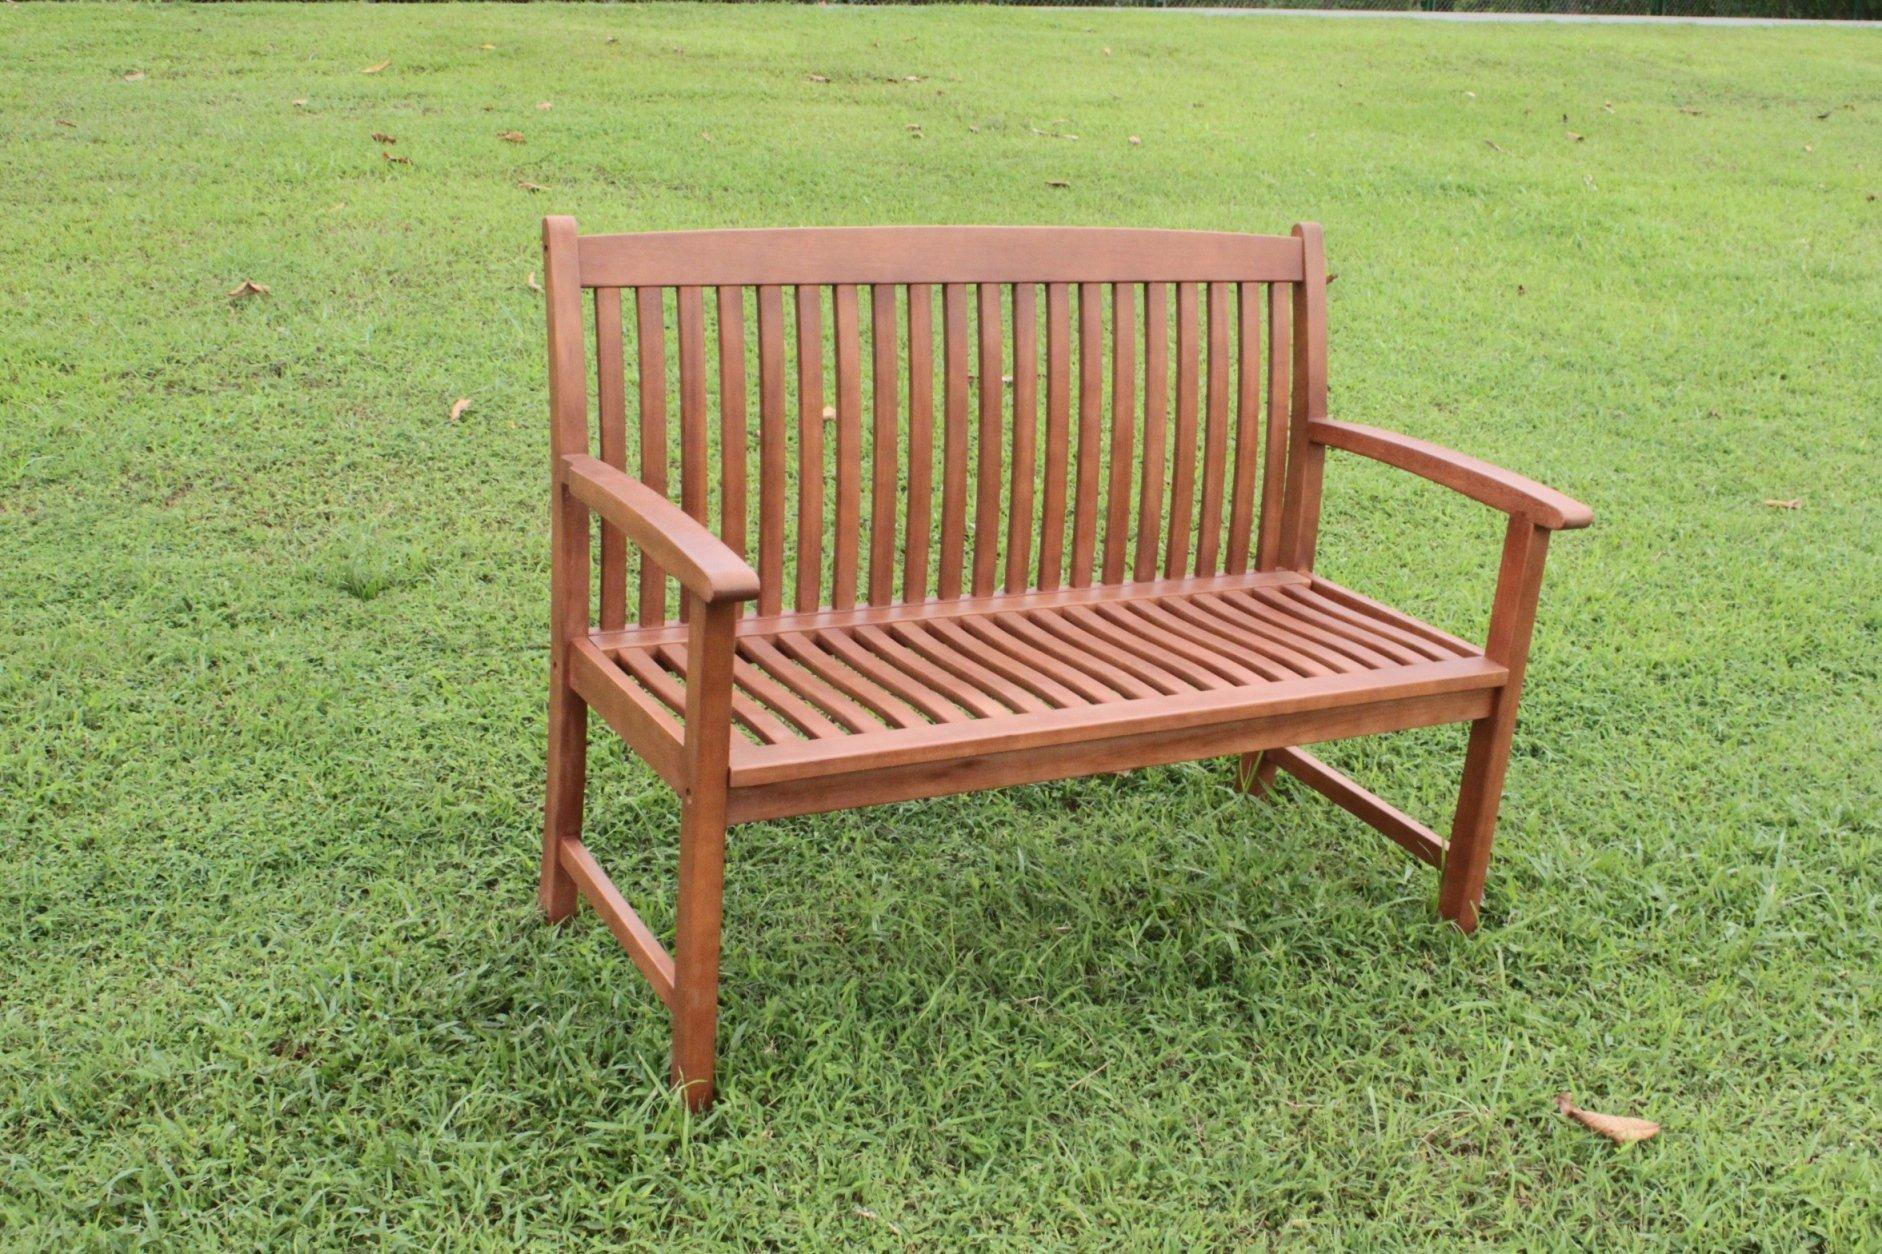 Cambridge Wooden Garden Bench U2013 3 Seater. 🔍. Sale!